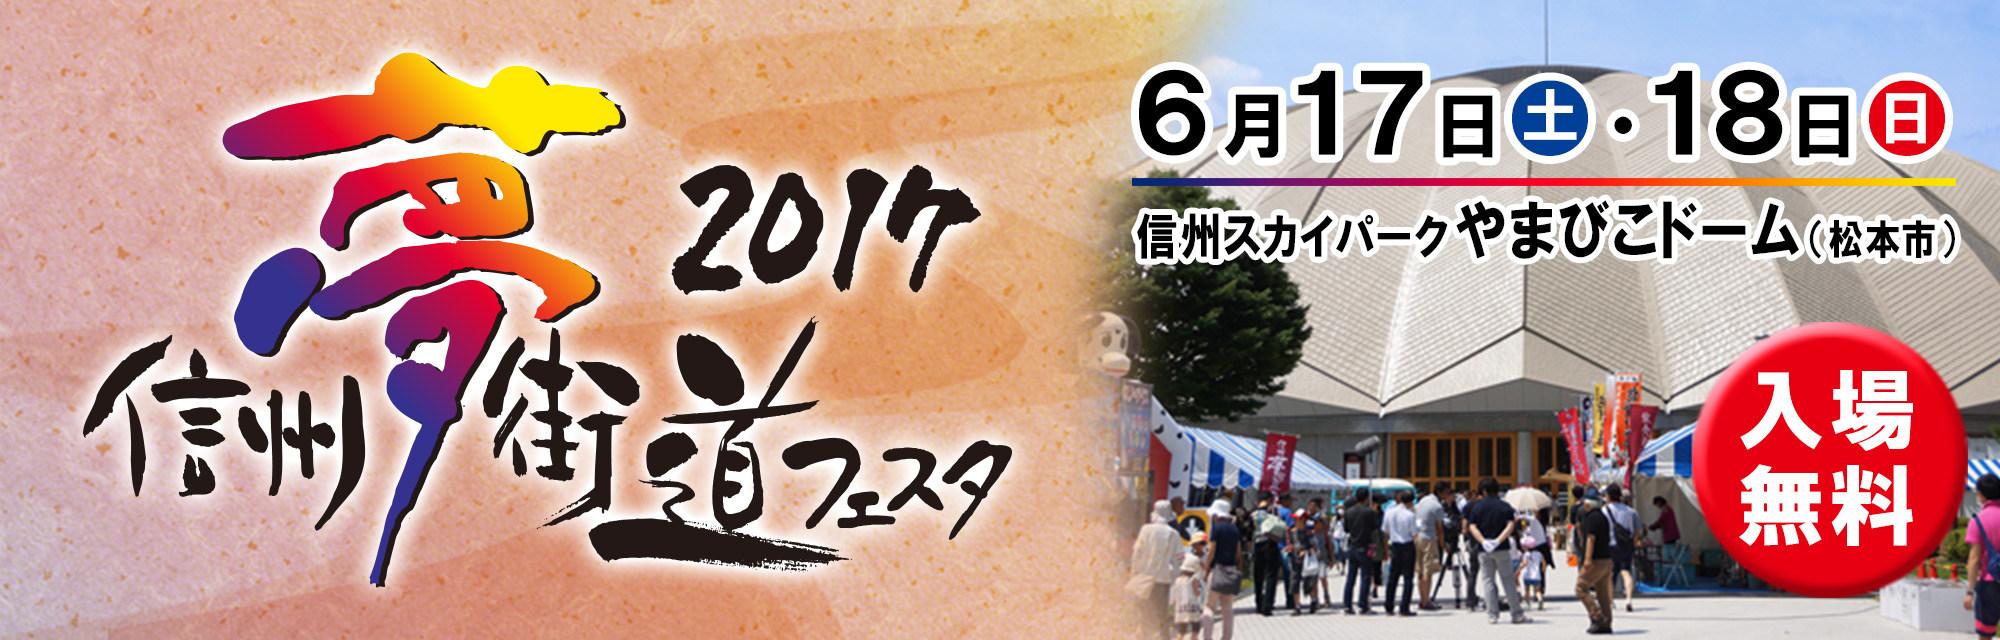 yumekaido2017_title.jpg